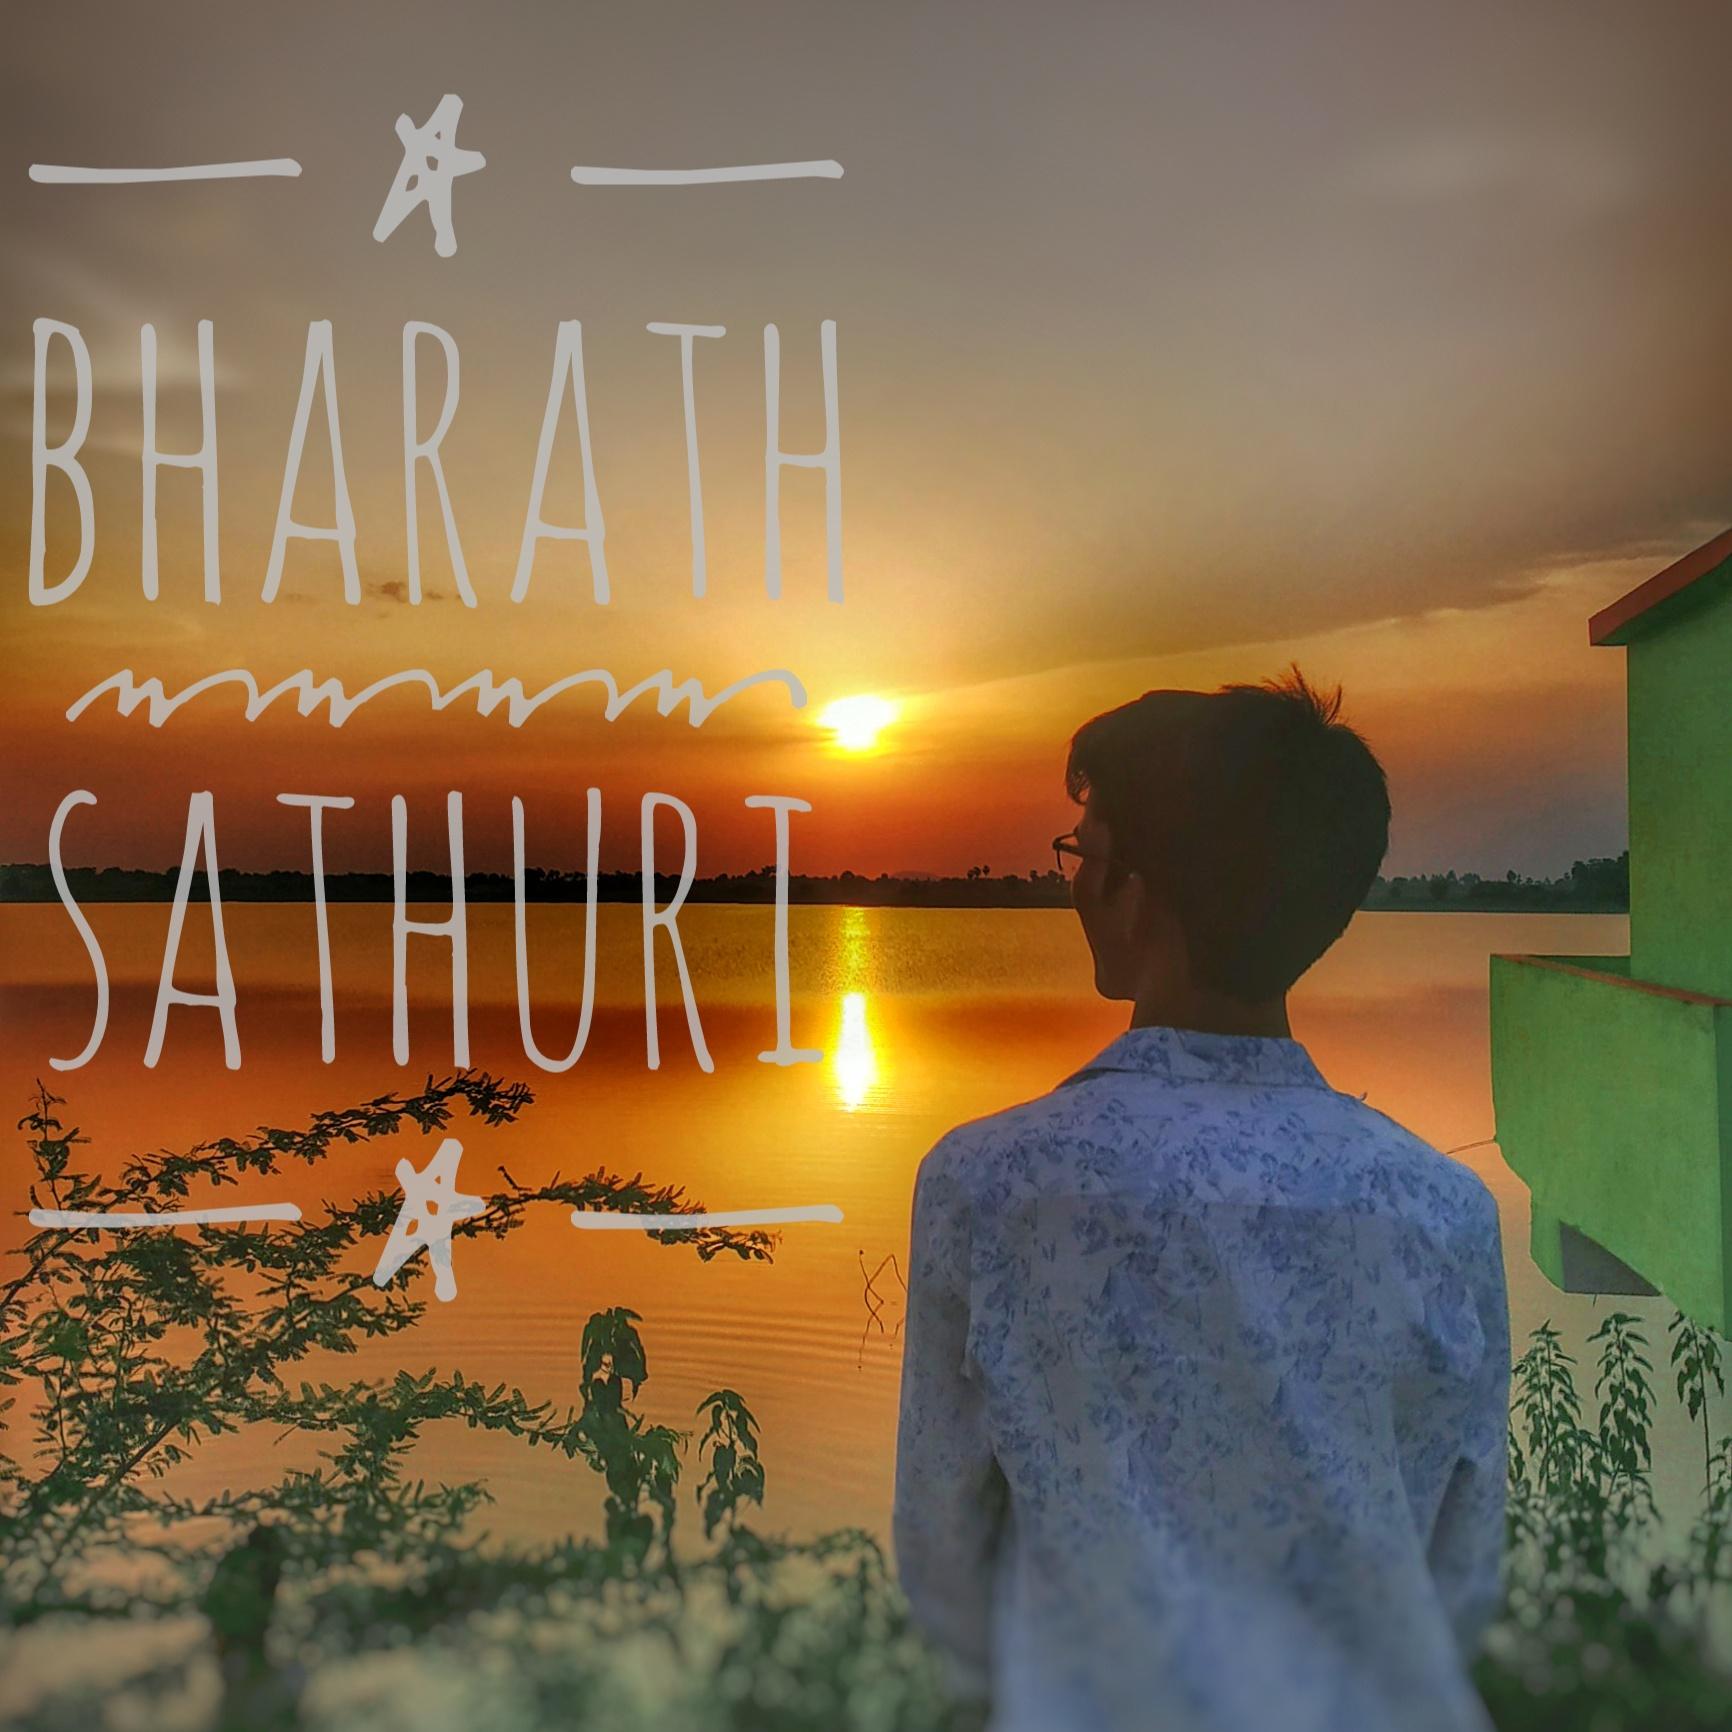 Bharath Sathuri